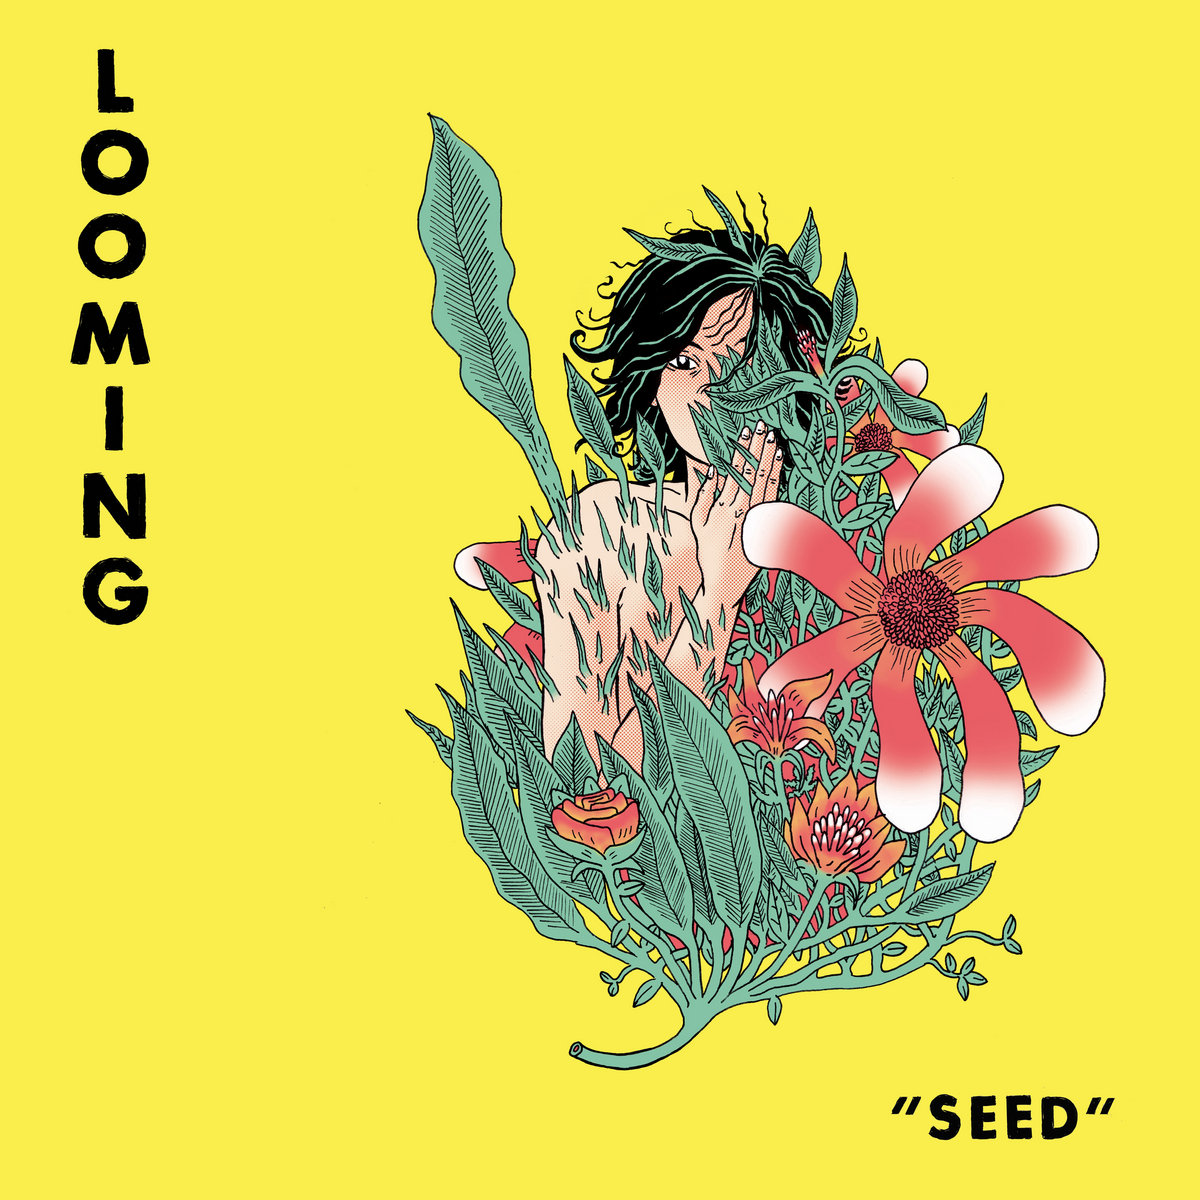 Afbeeldingsresultaat voor Looming-Seed, album cover